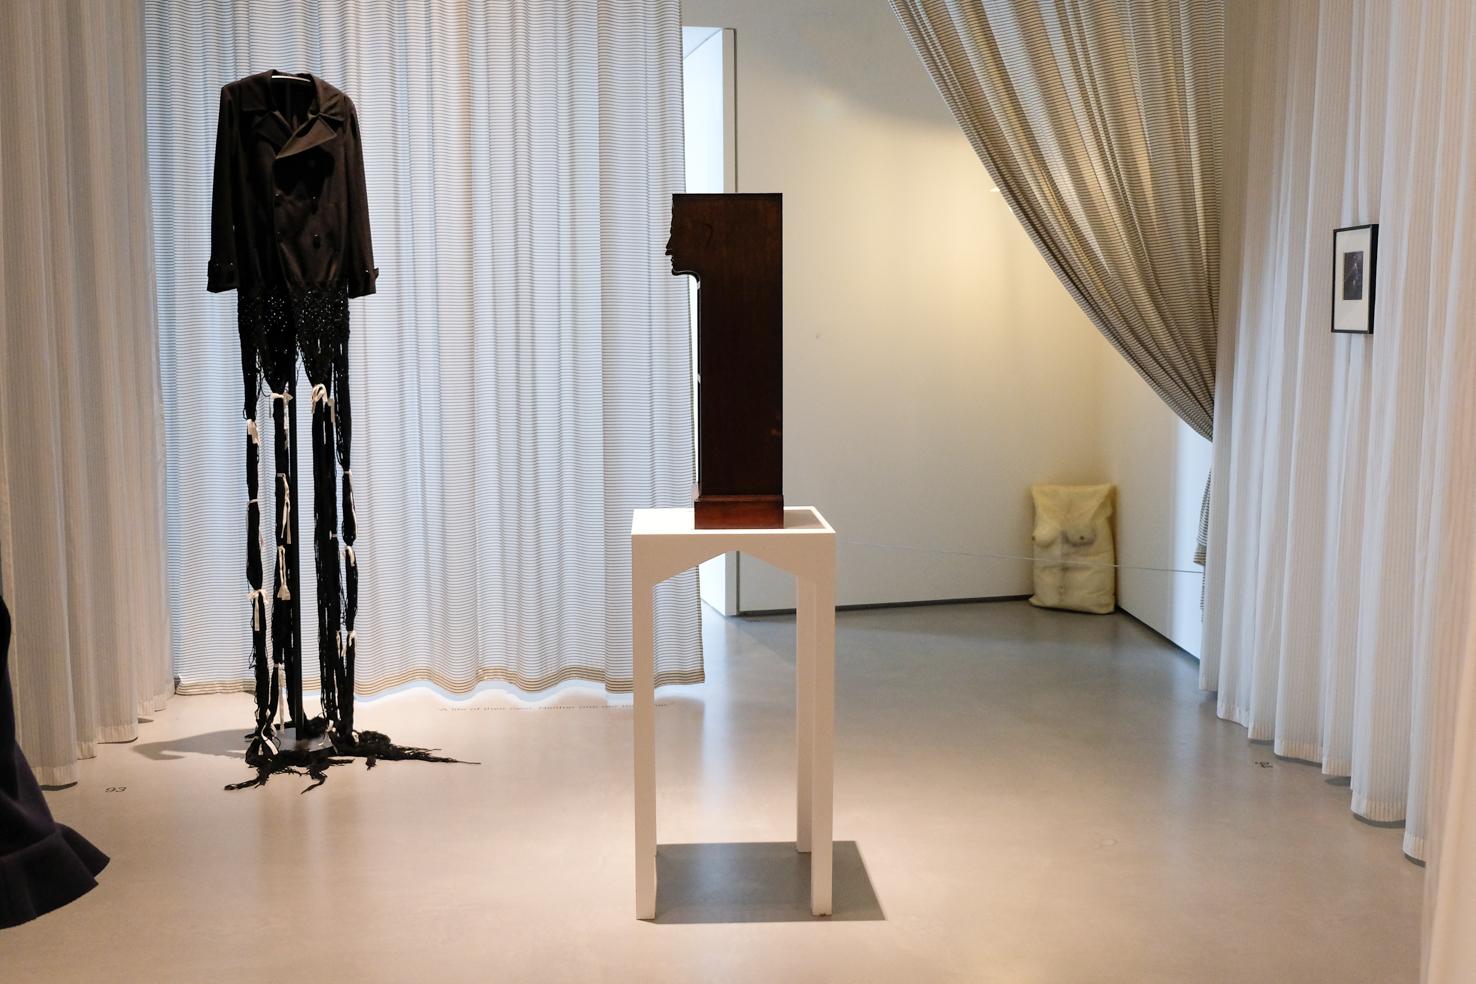 08 C F A  Voysey bookcase 1900 Robert Gober Untitled 1990 Yohji Yamamoto Long Hair coat 2003